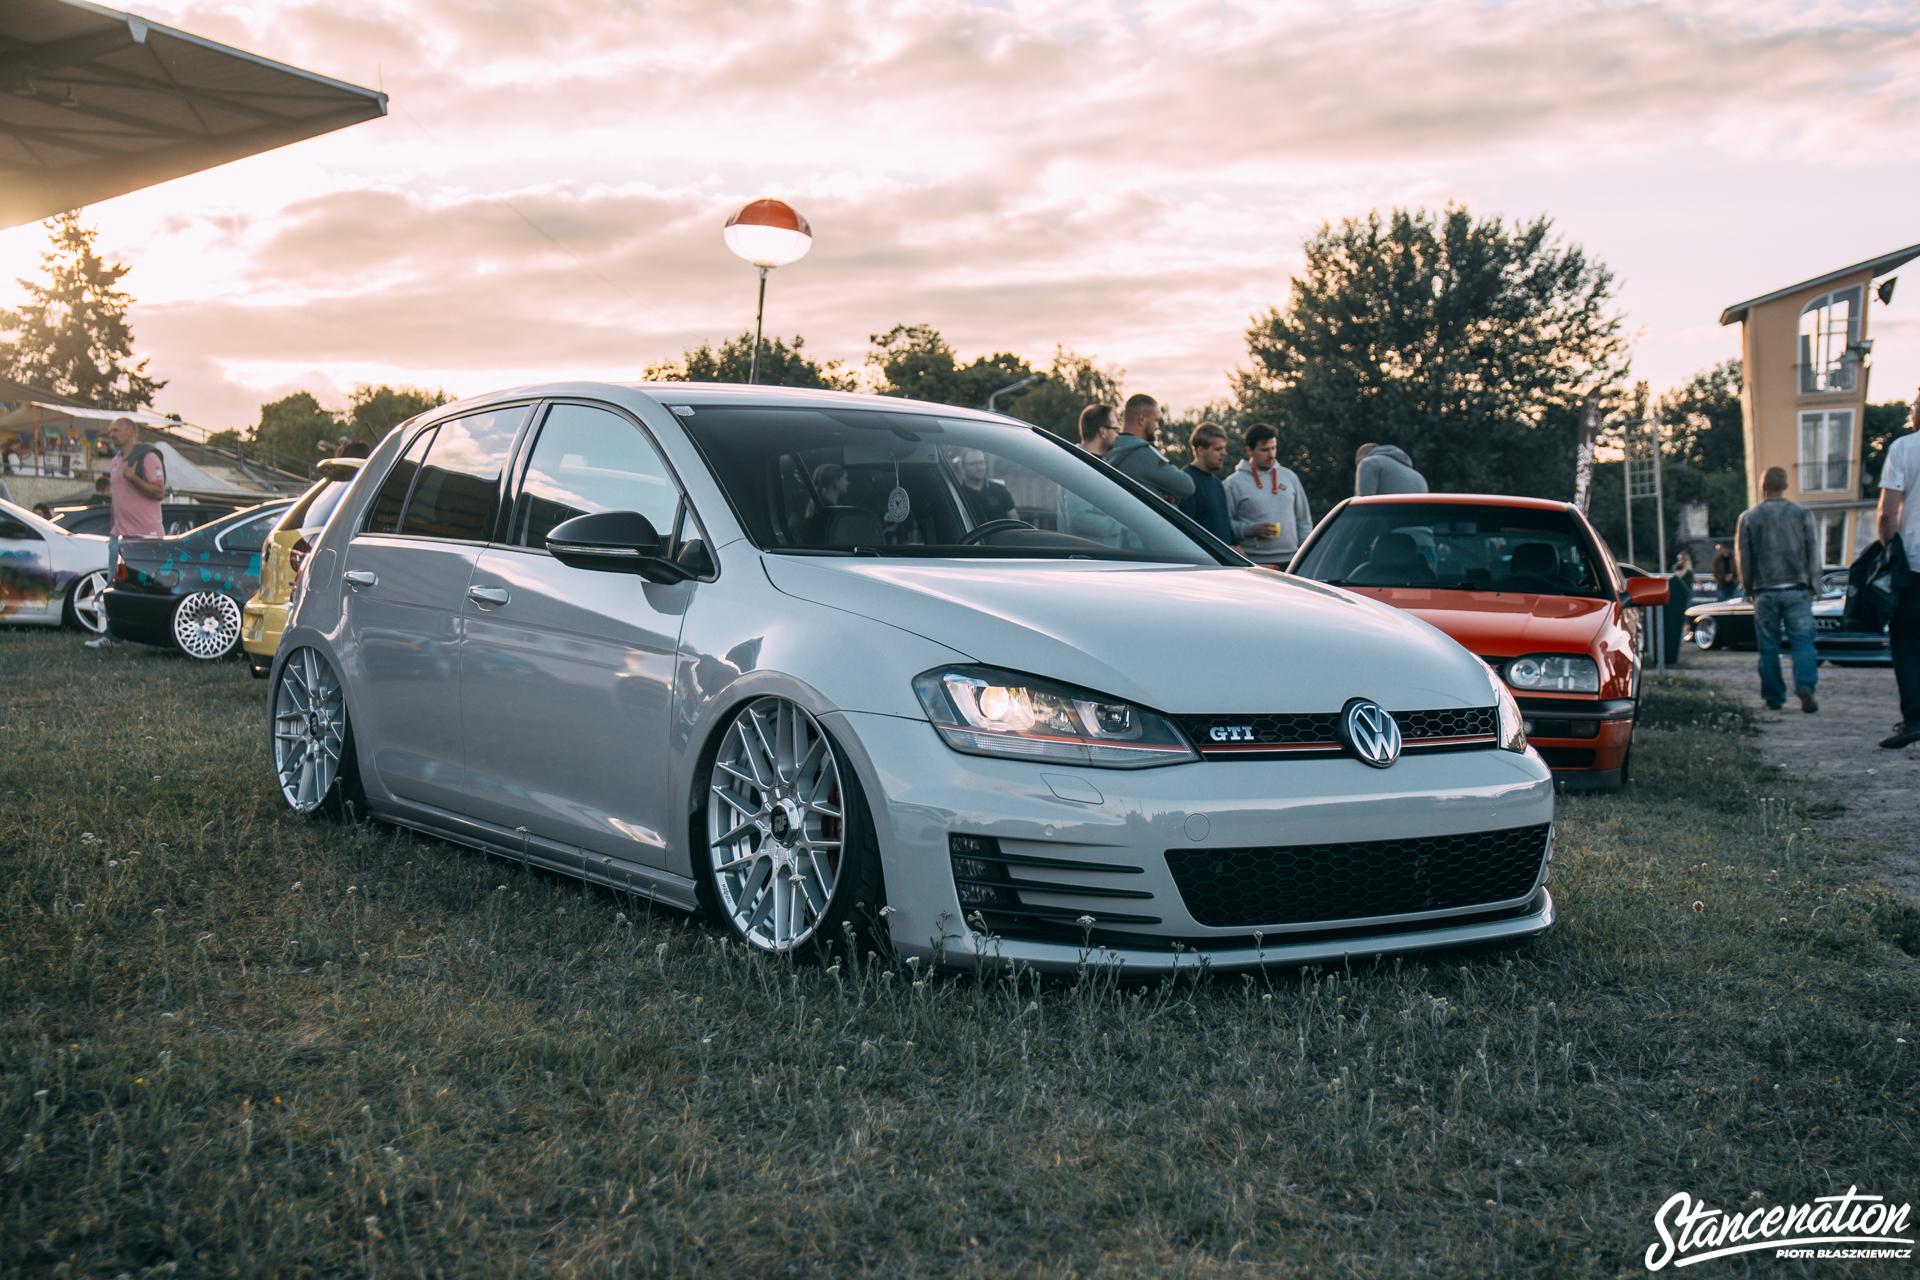 Wallpaper Stancenation Stance Vehicle Car Volkswagen